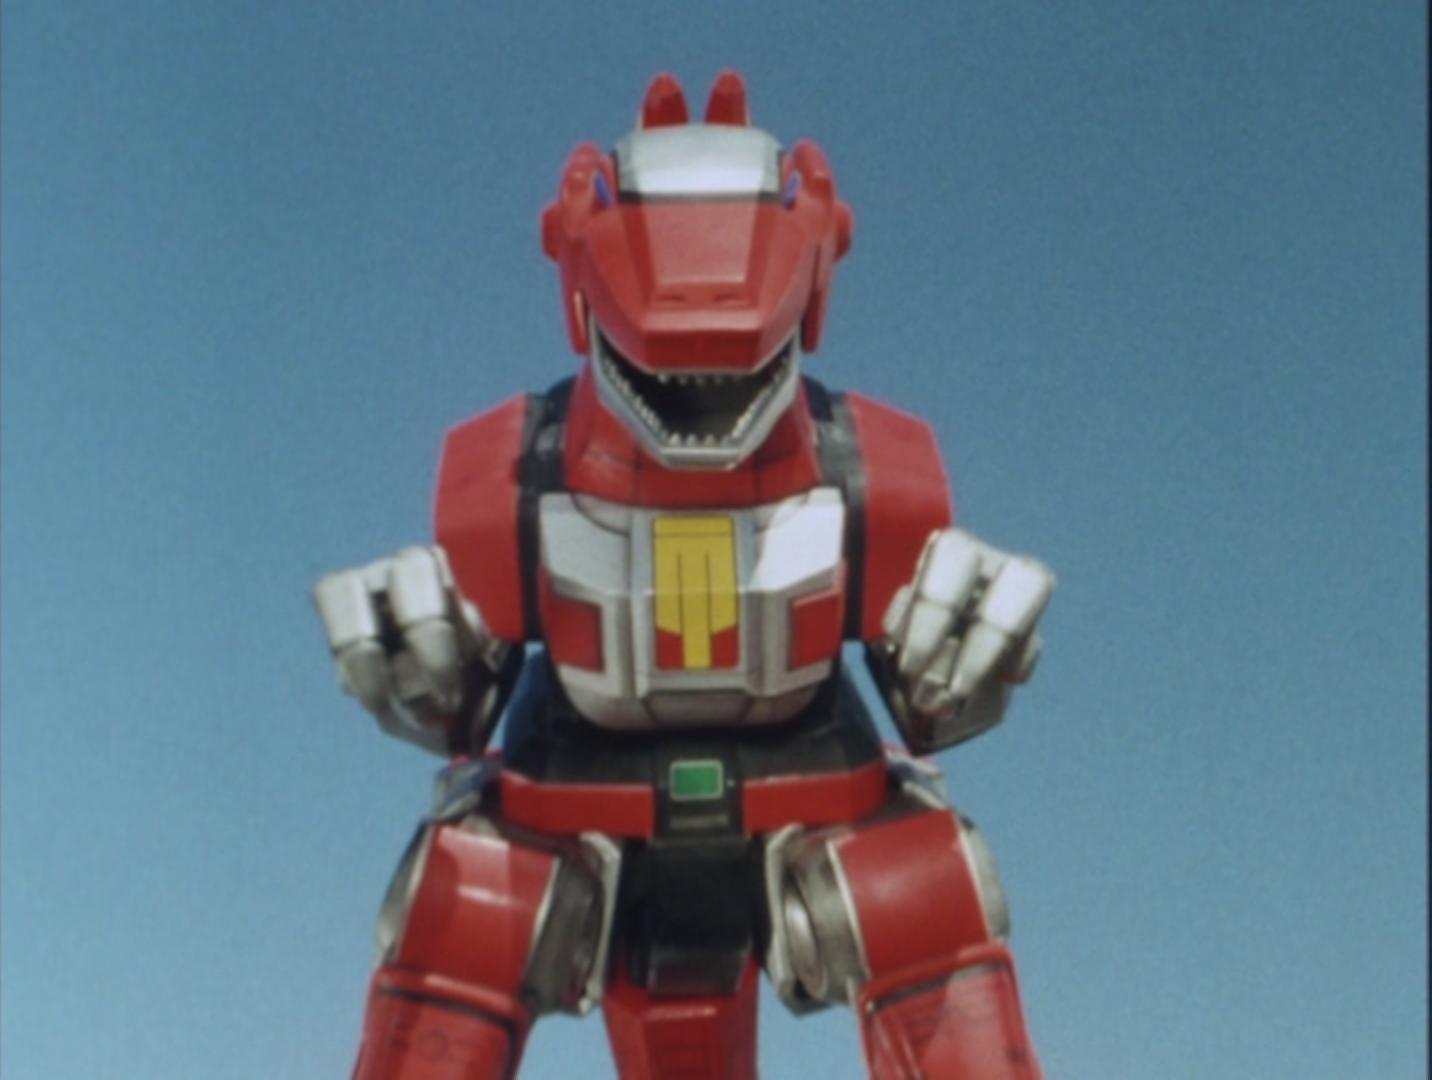 Zyurangers/Power rangers Dinozords reffrence images still